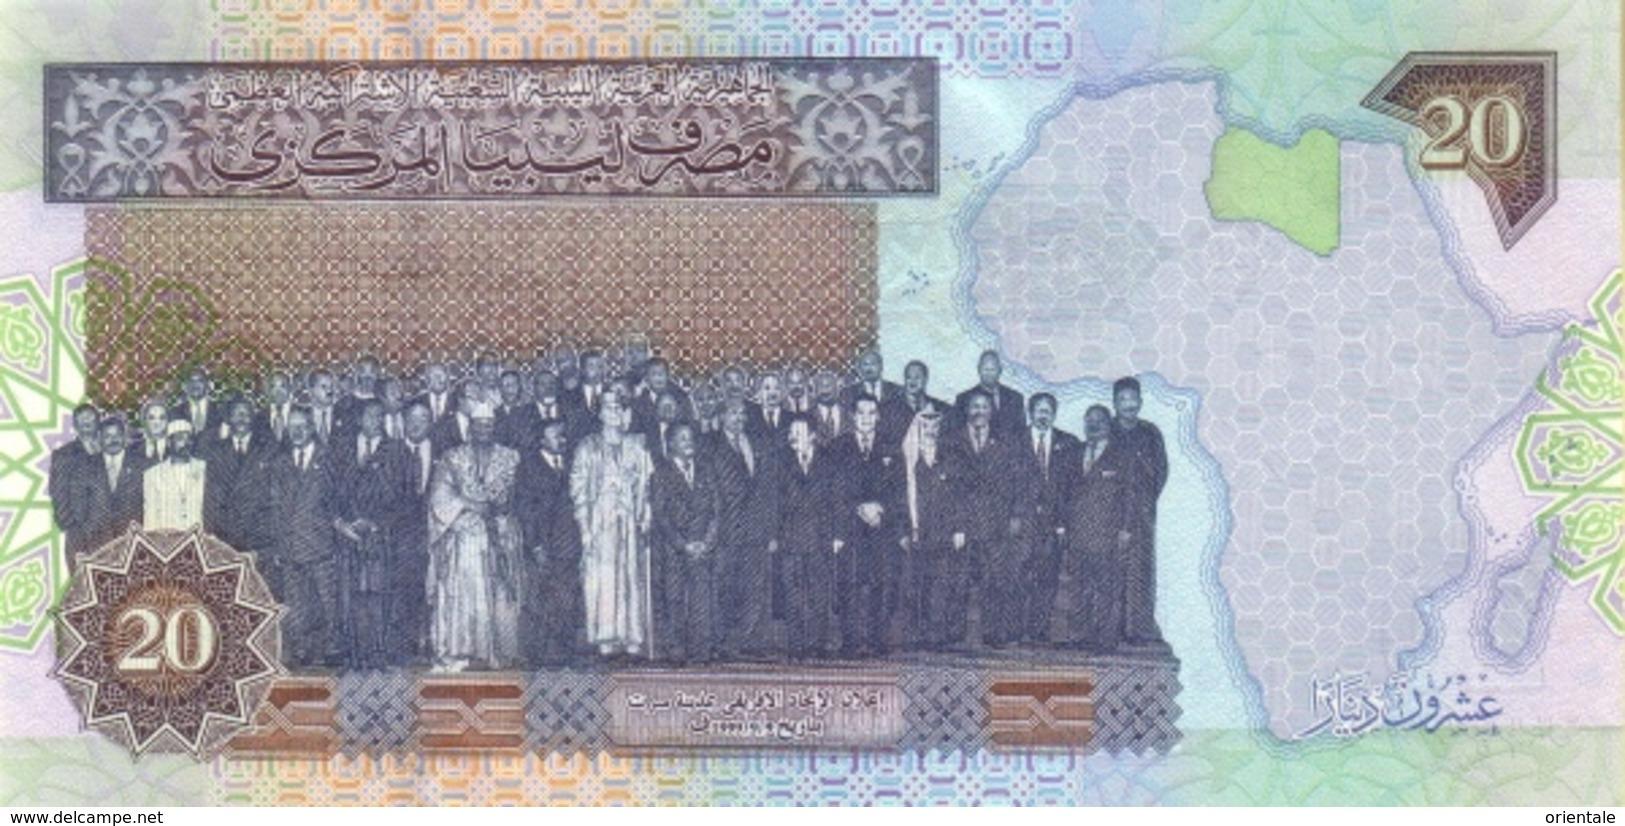 LIBYA P. 67a 20 D 2002 UNC - Libye